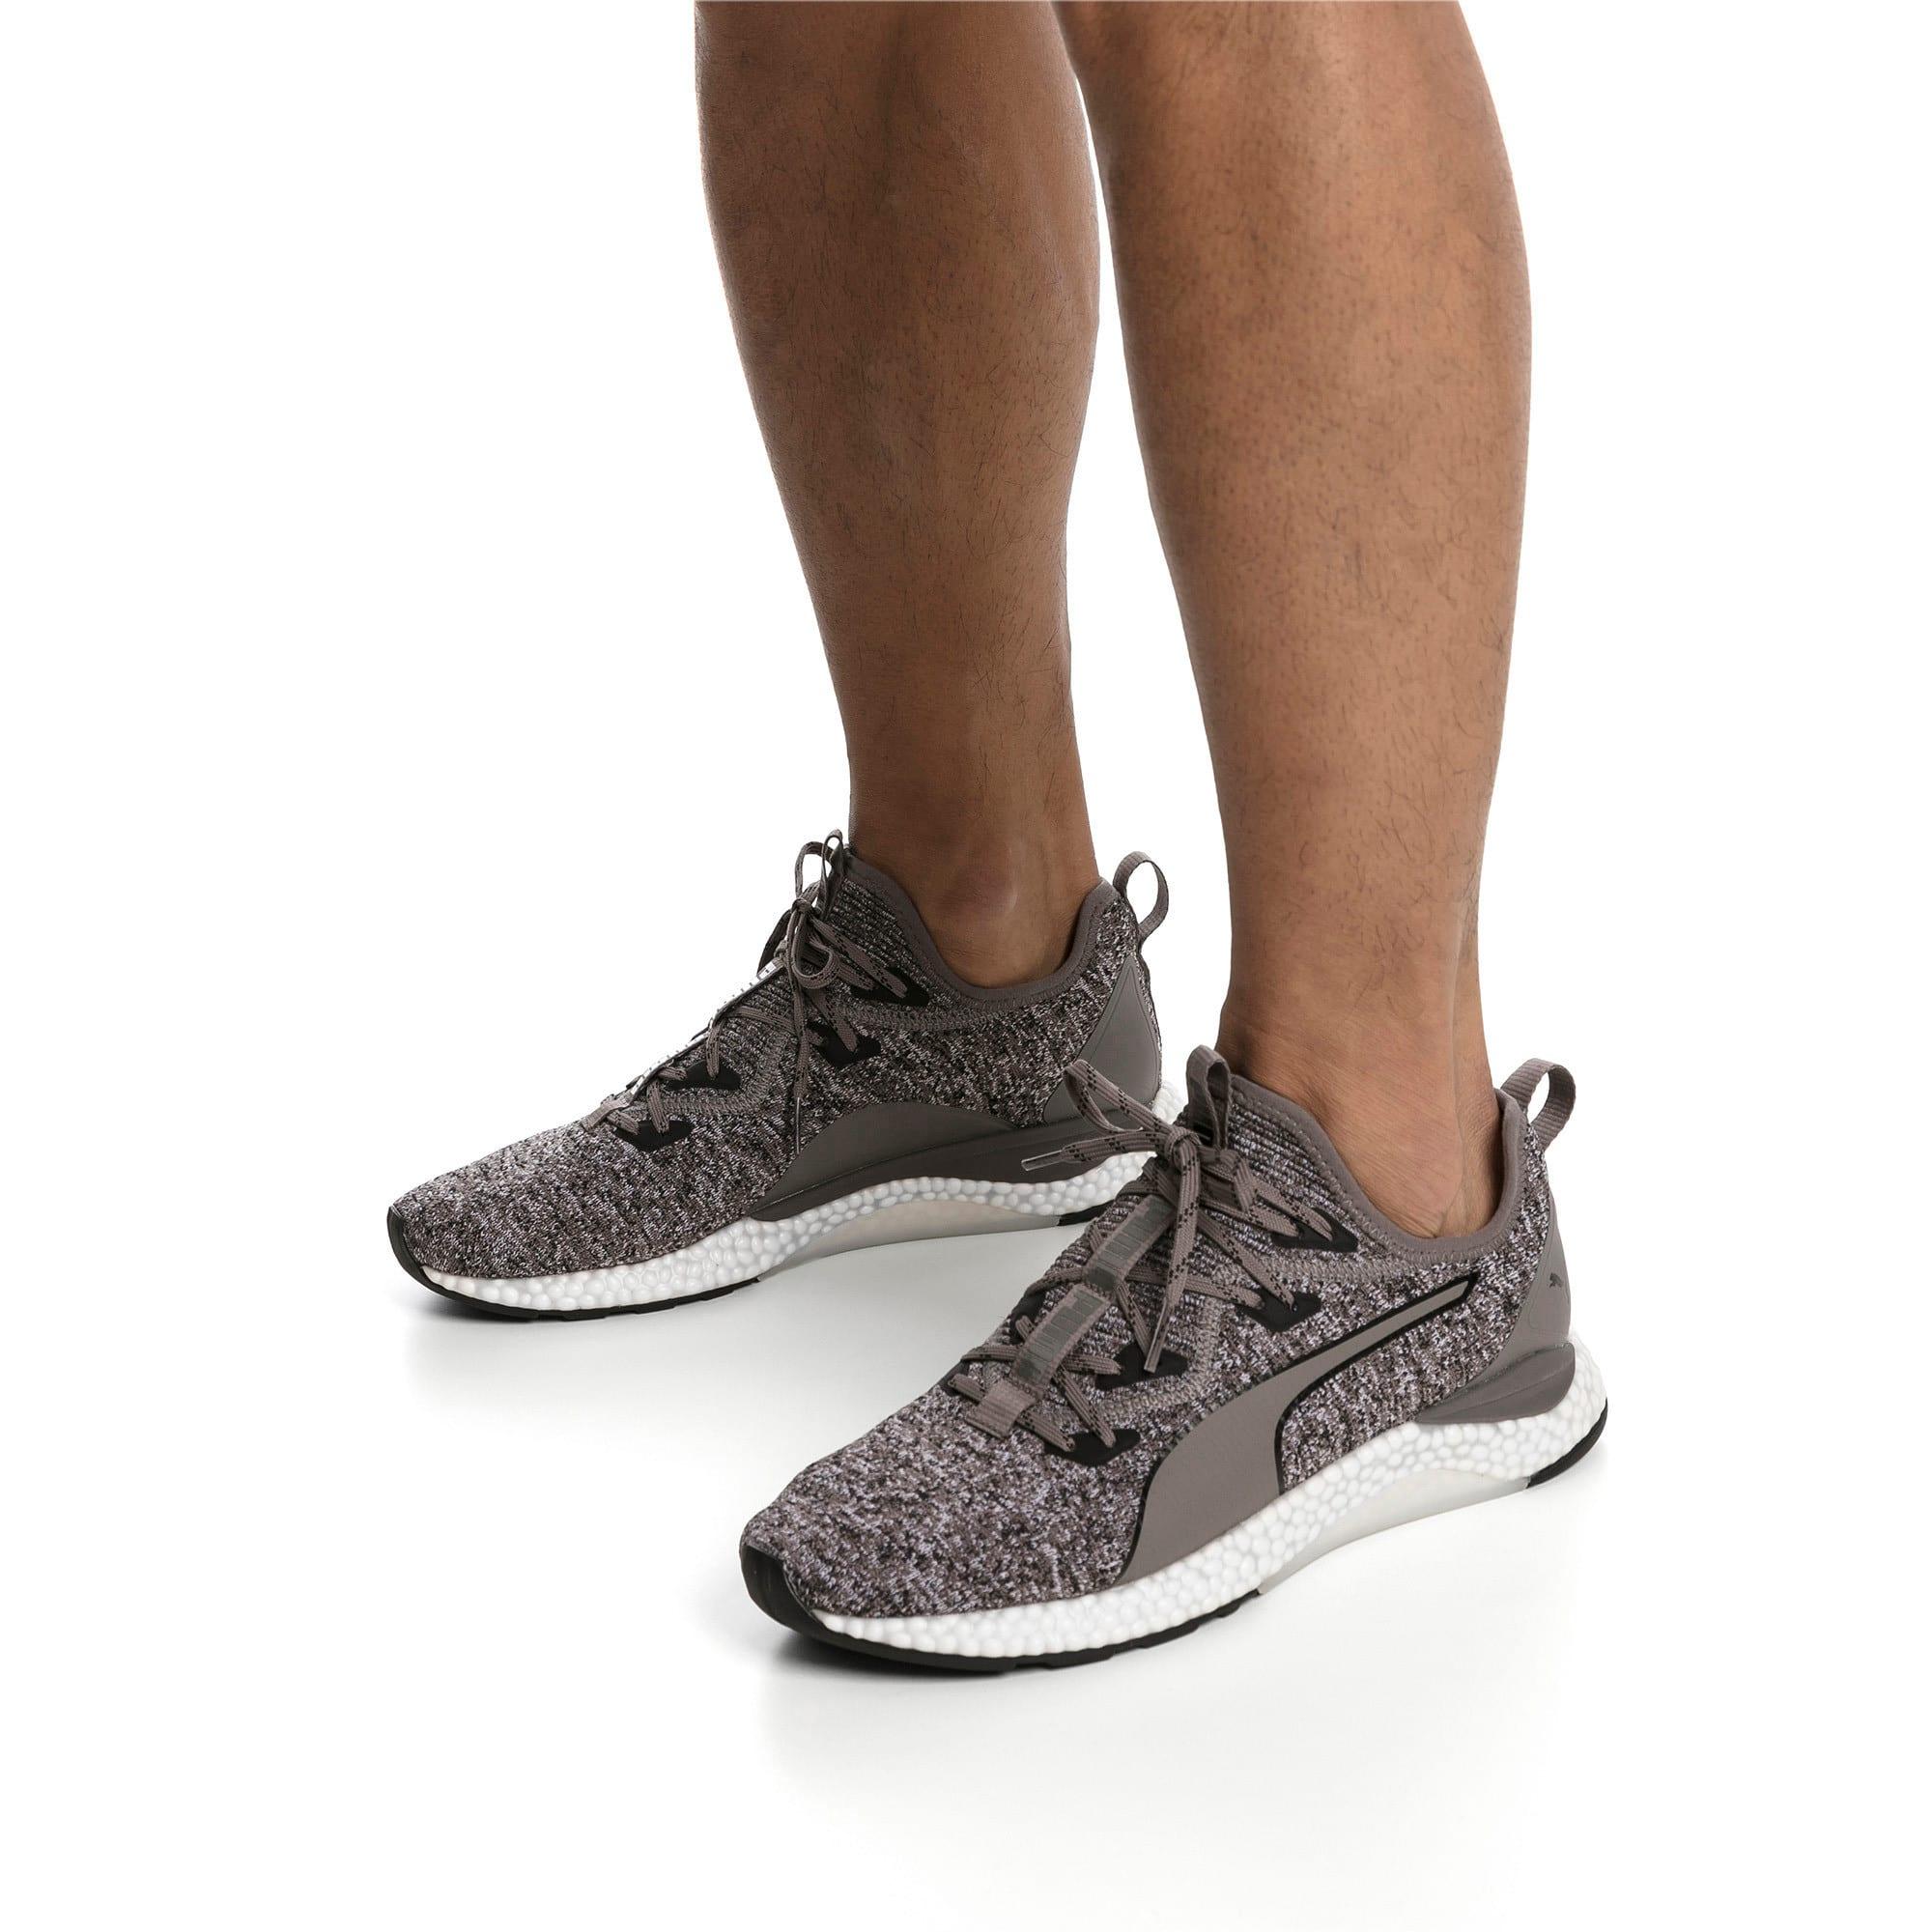 Thumbnail 8 of Hybrid Runner Men's Running Shoes, Charcoal Gray-Puma White, medium-IND